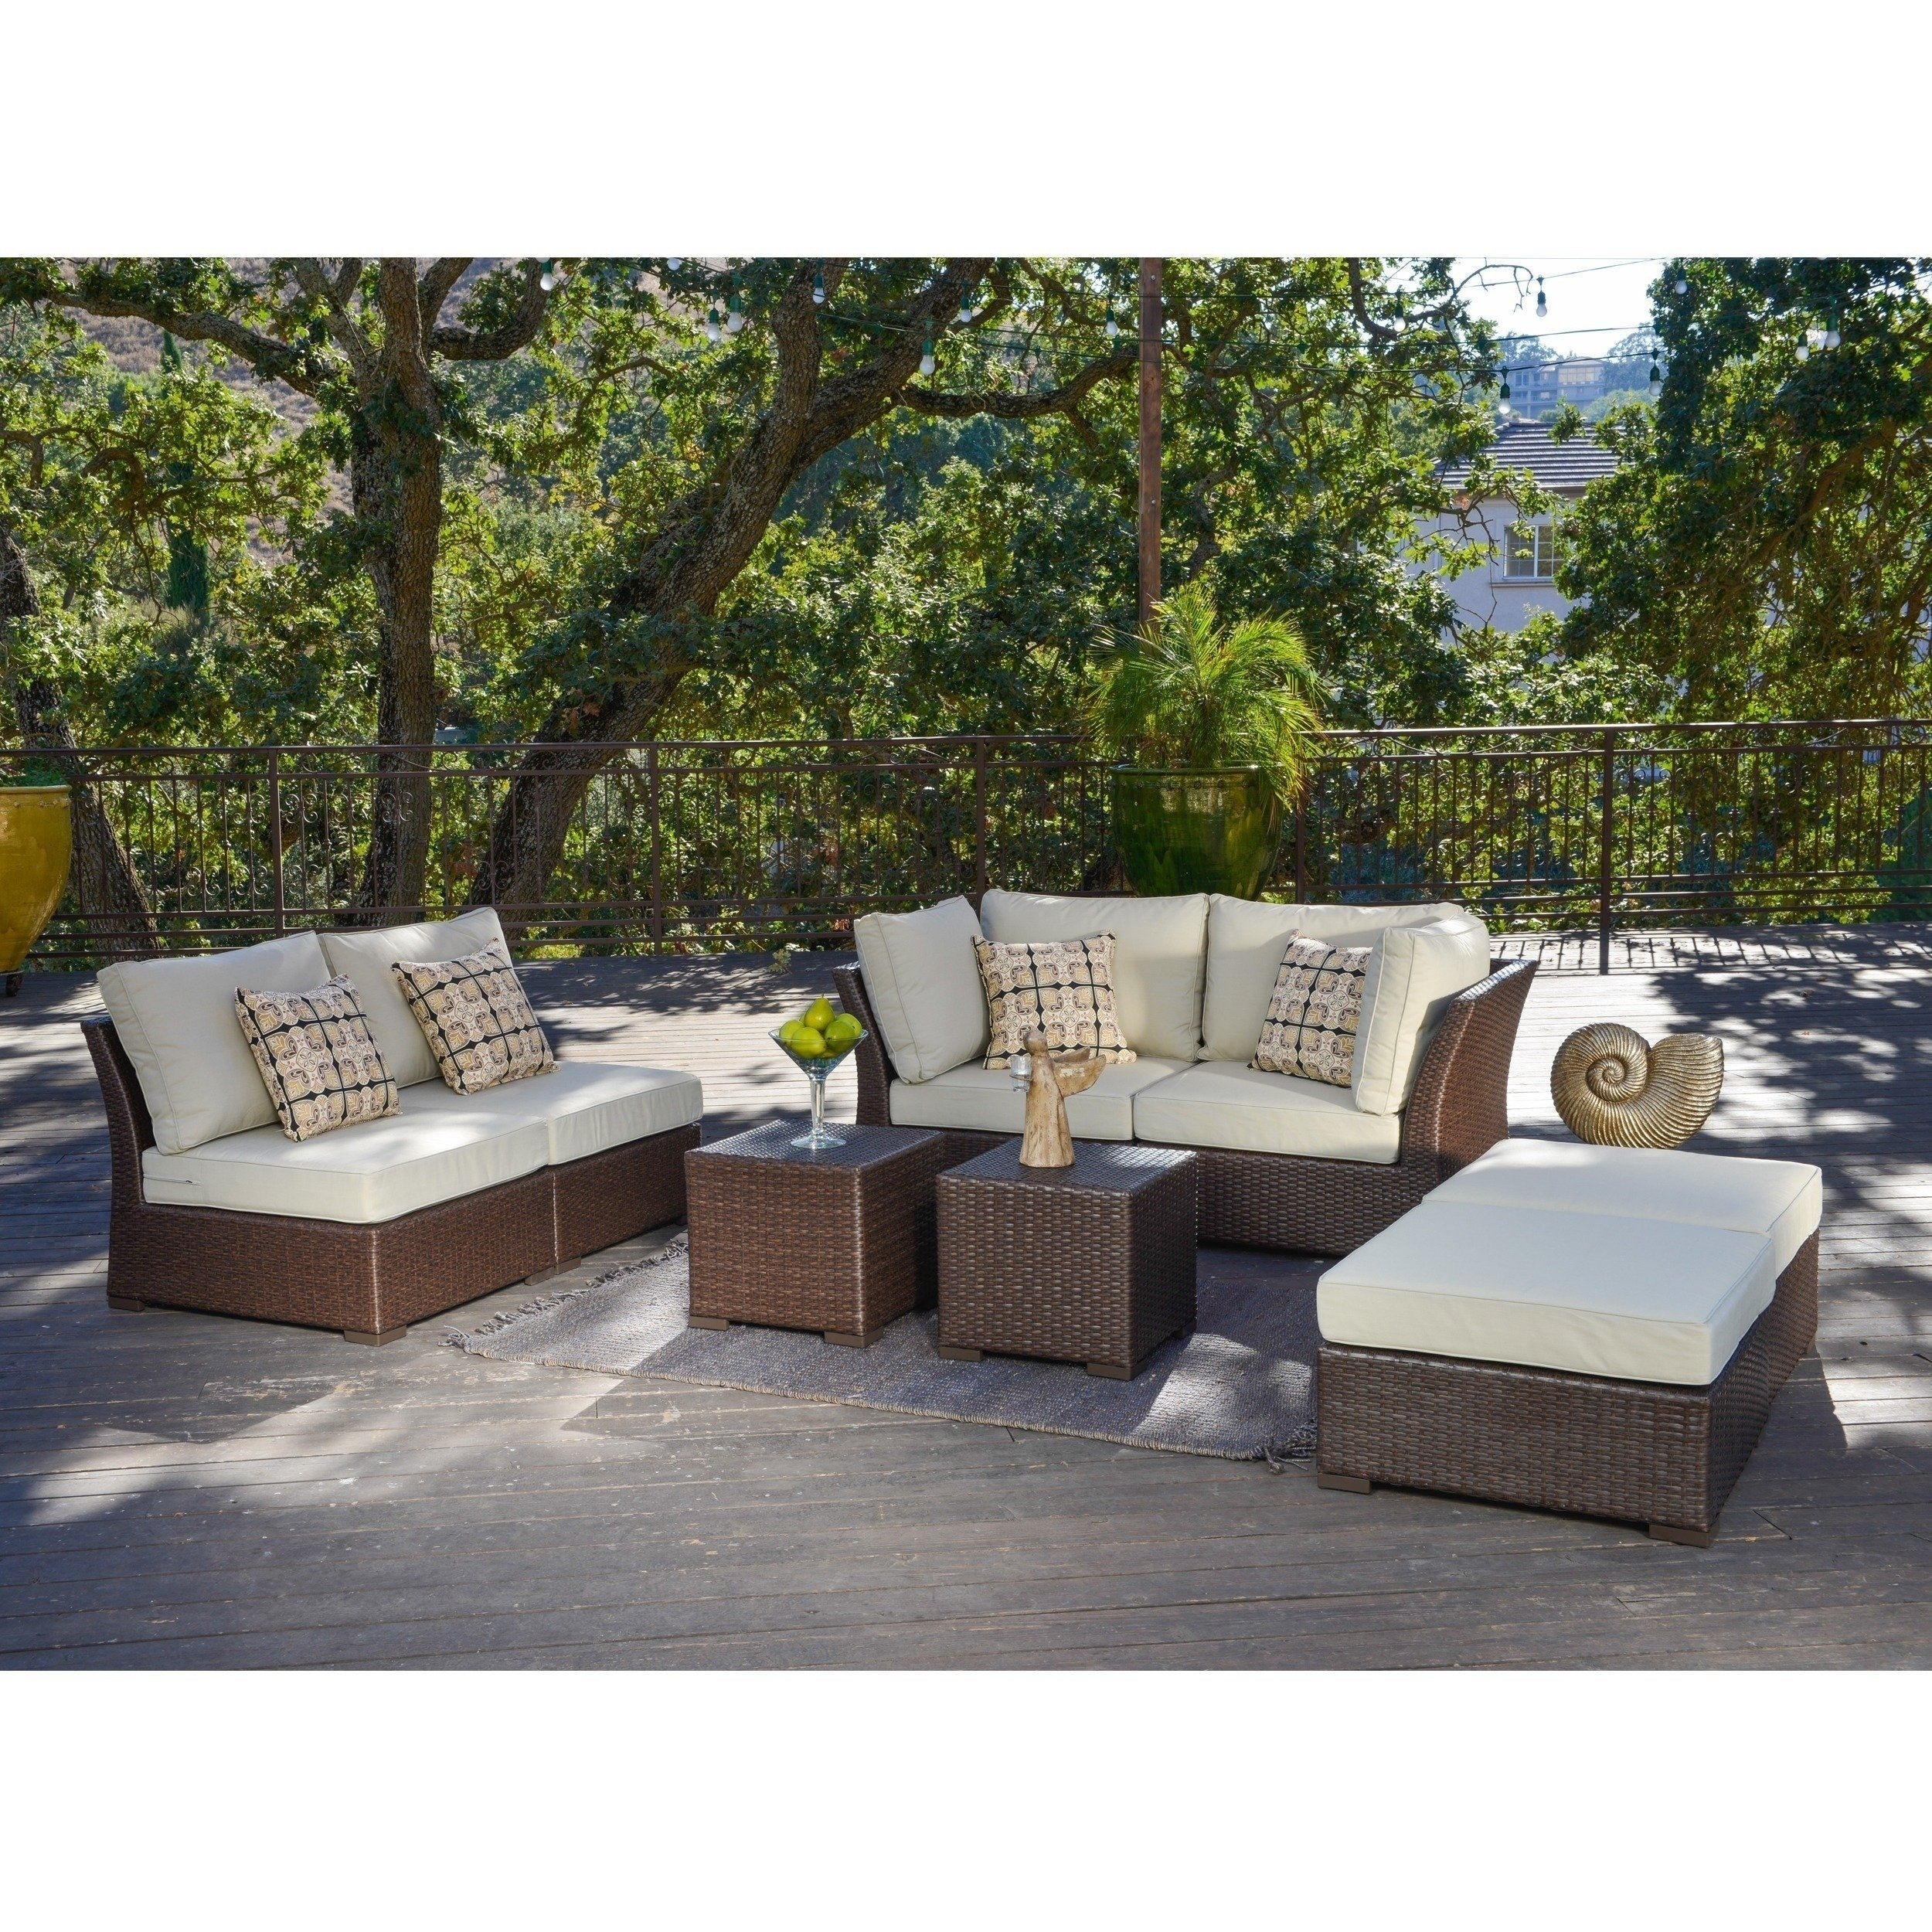 shop corvus oreanne 8 piece brown wicker patio furniture set free rh overstock com Light Brown Wicker Patio Furniture Light Brown Wicker Patio Furniture